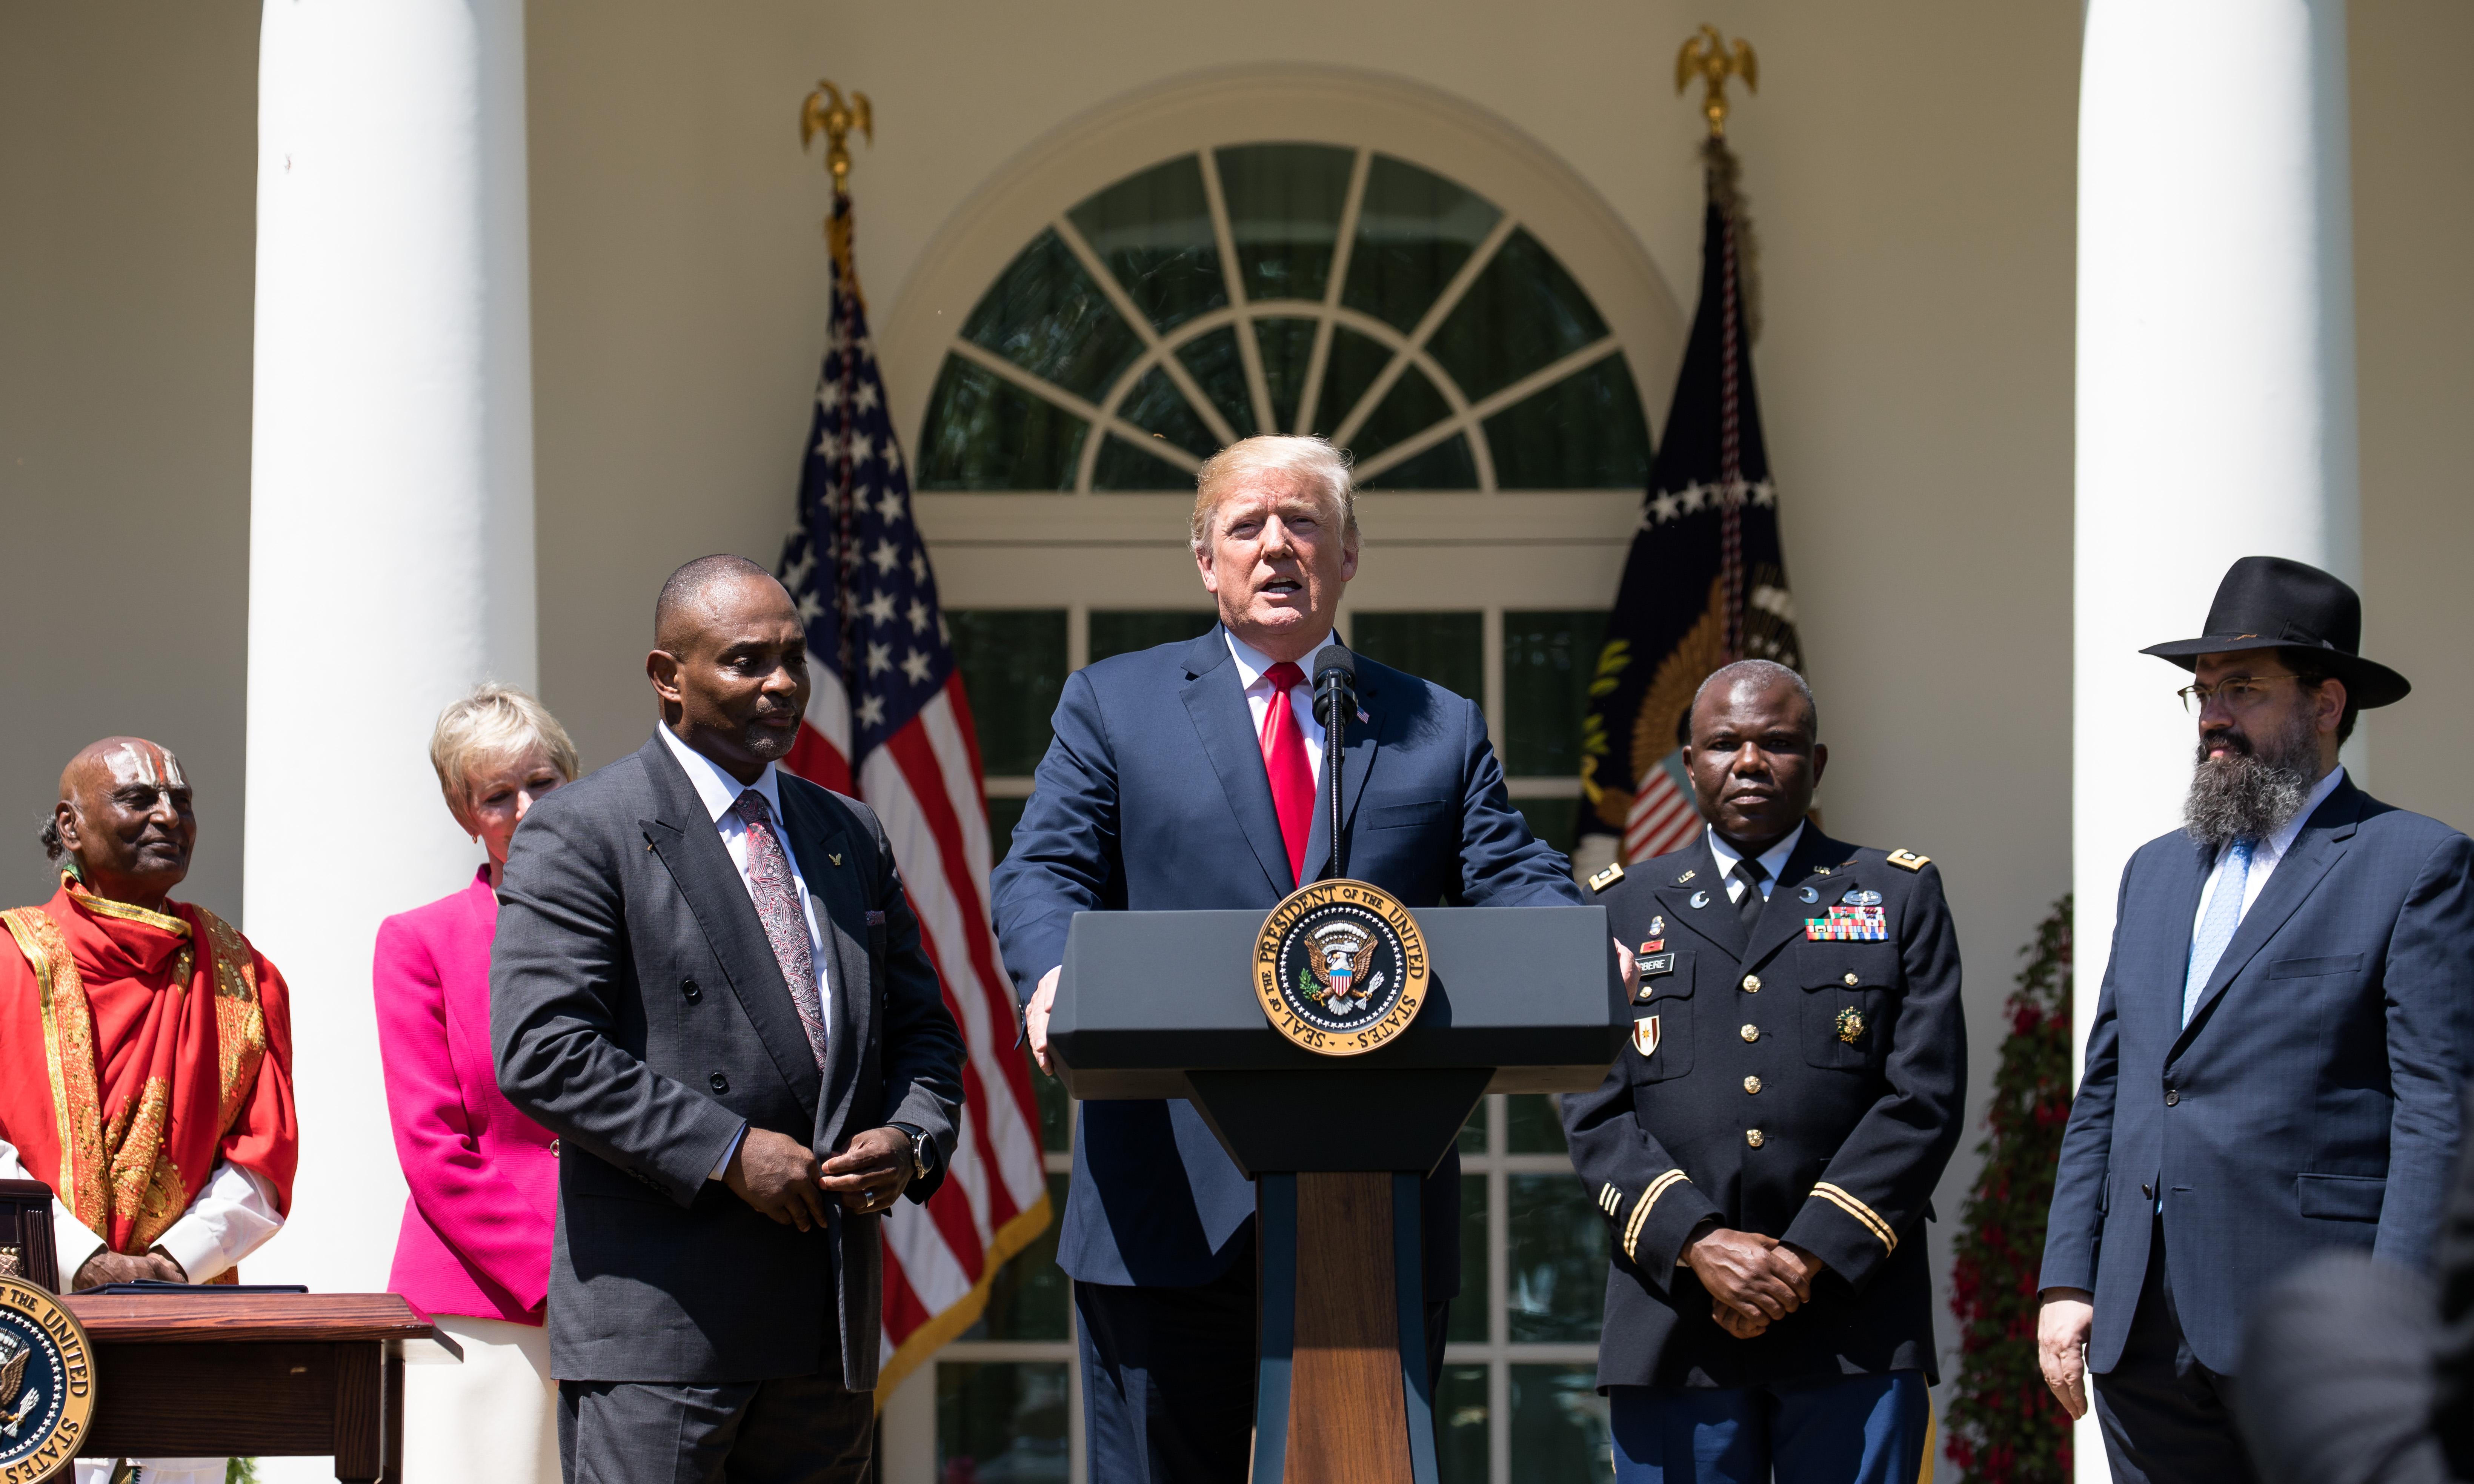 Donald Trump vows to defend religious freedoms 'always'